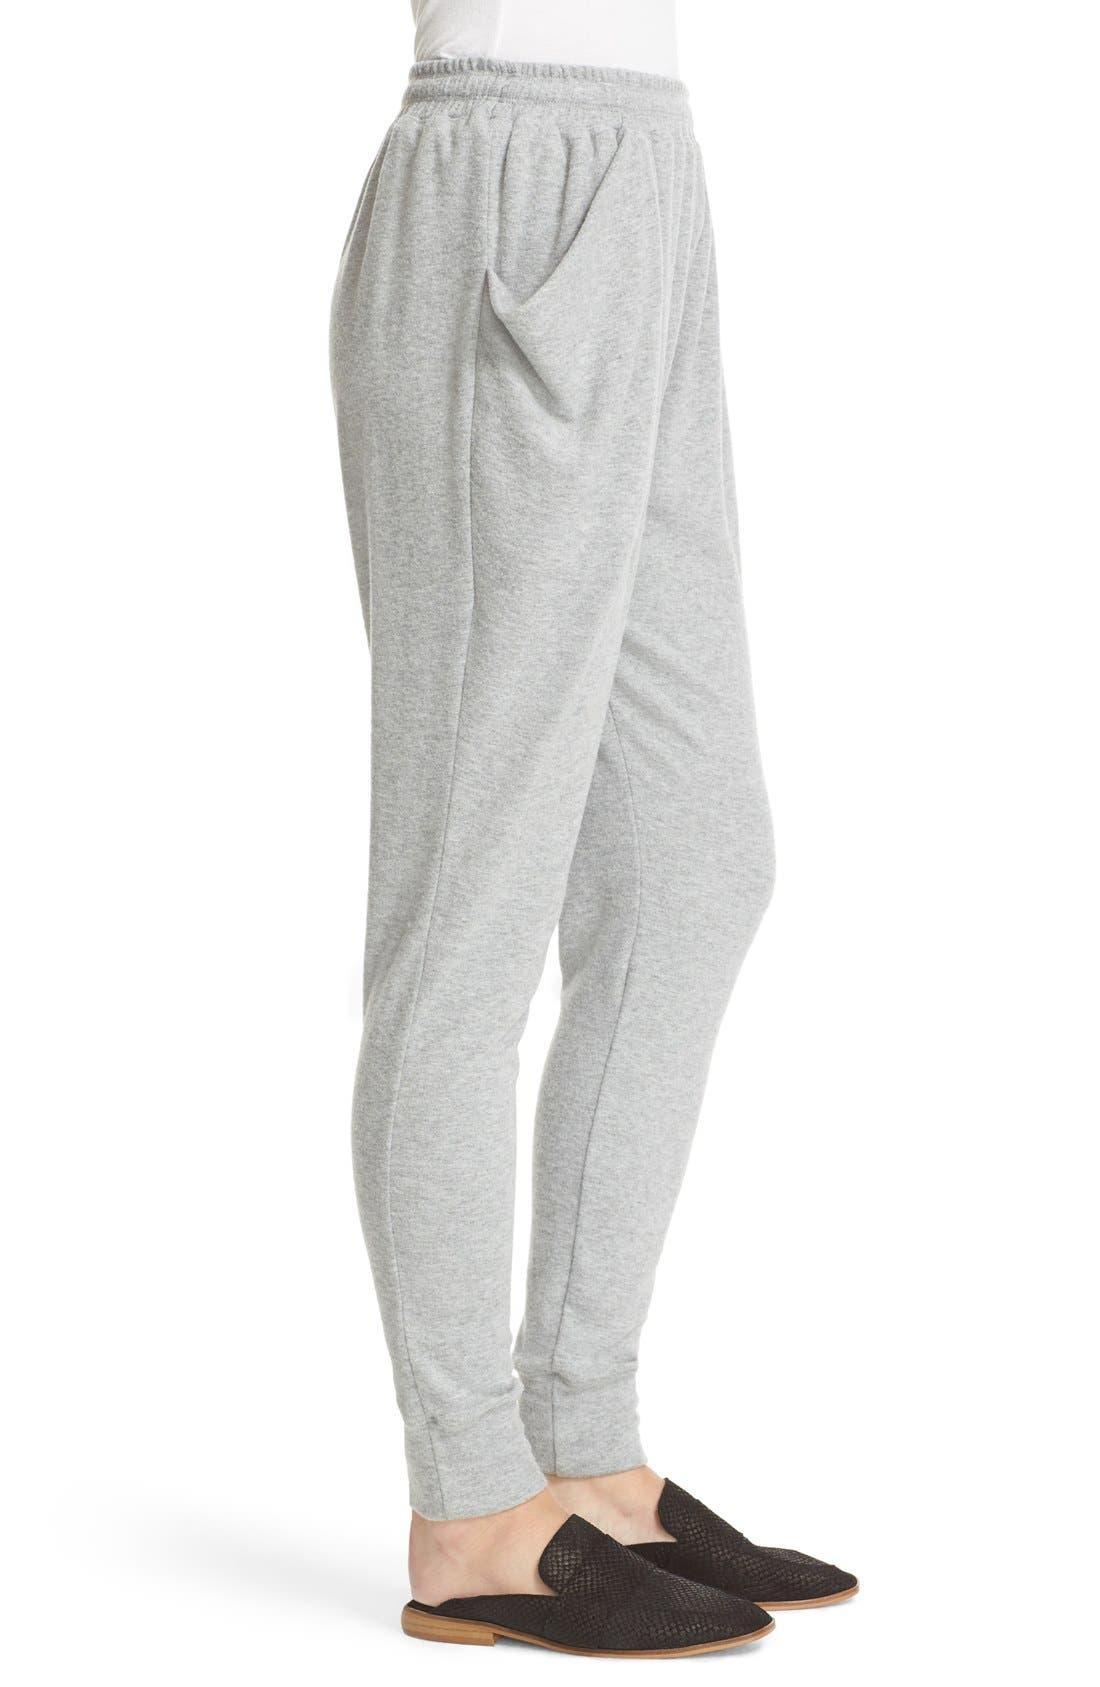 Everyone Loves This Jogger Pants,                             Alternate thumbnail 3, color,                             Grey